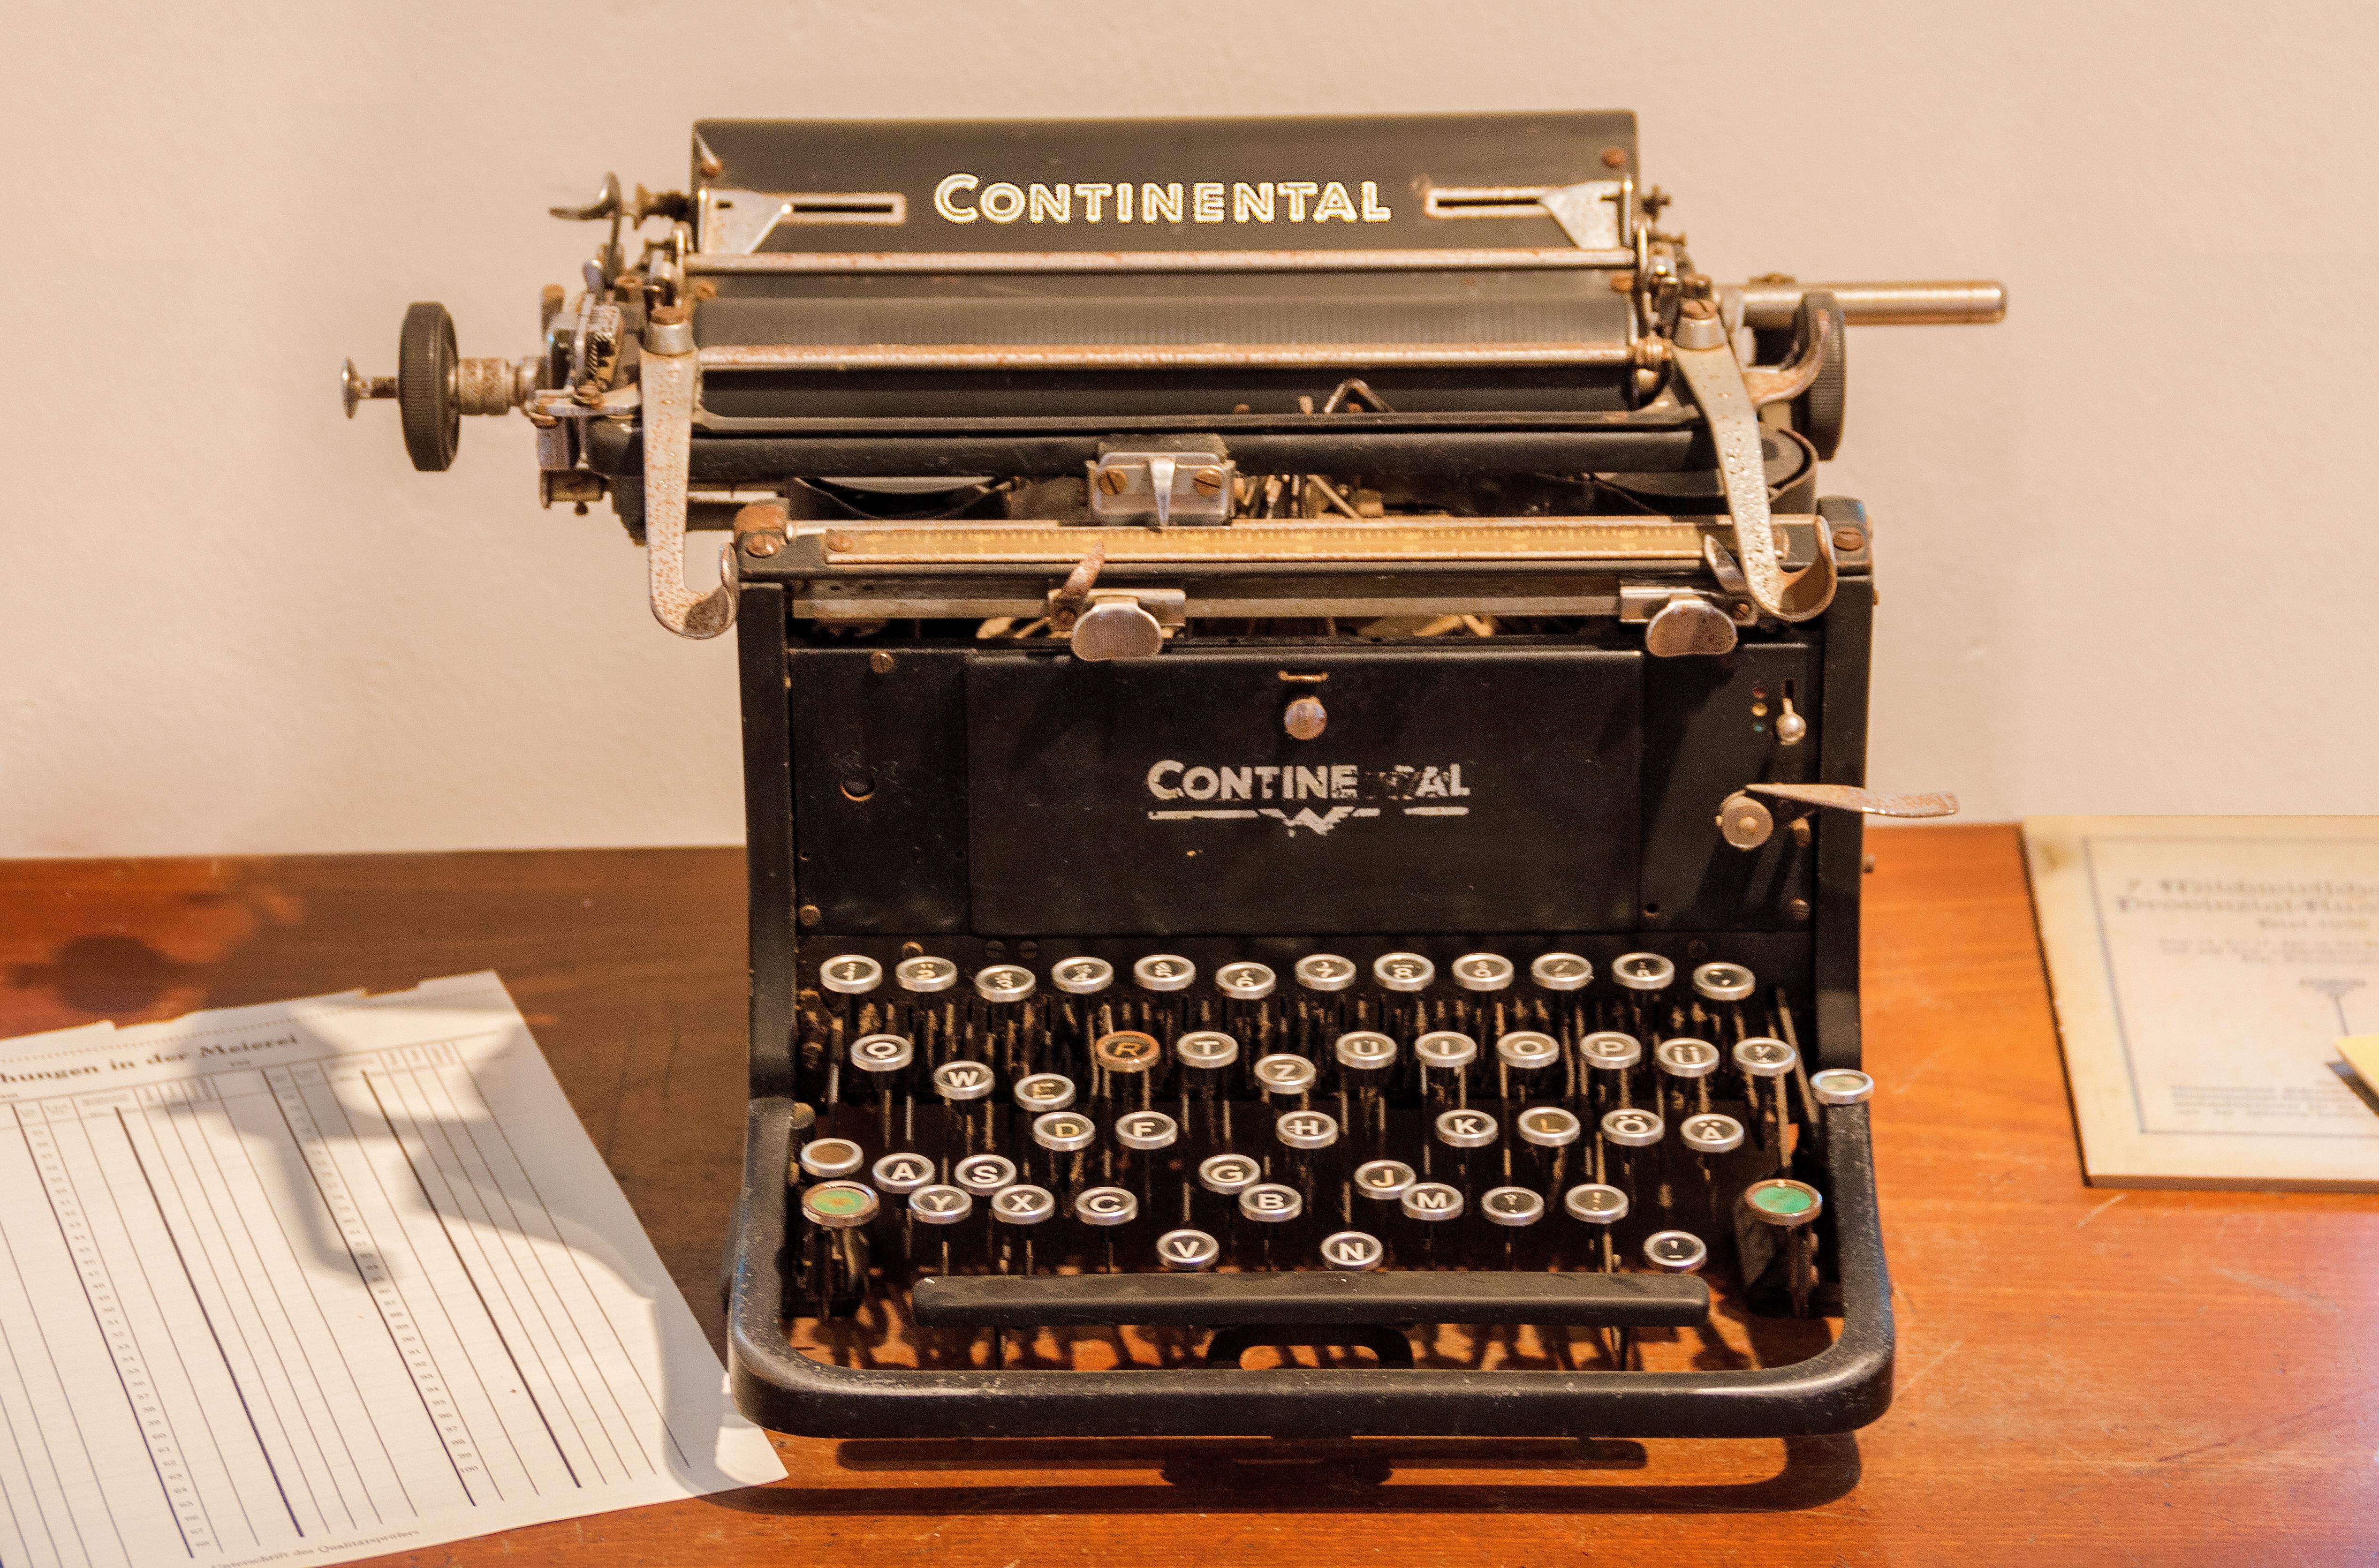 Keyboard Vintage Retro Leaf Old Typewriter Office Nostalgia Paper Old  Typewriter Tap Text Keys Letters Input